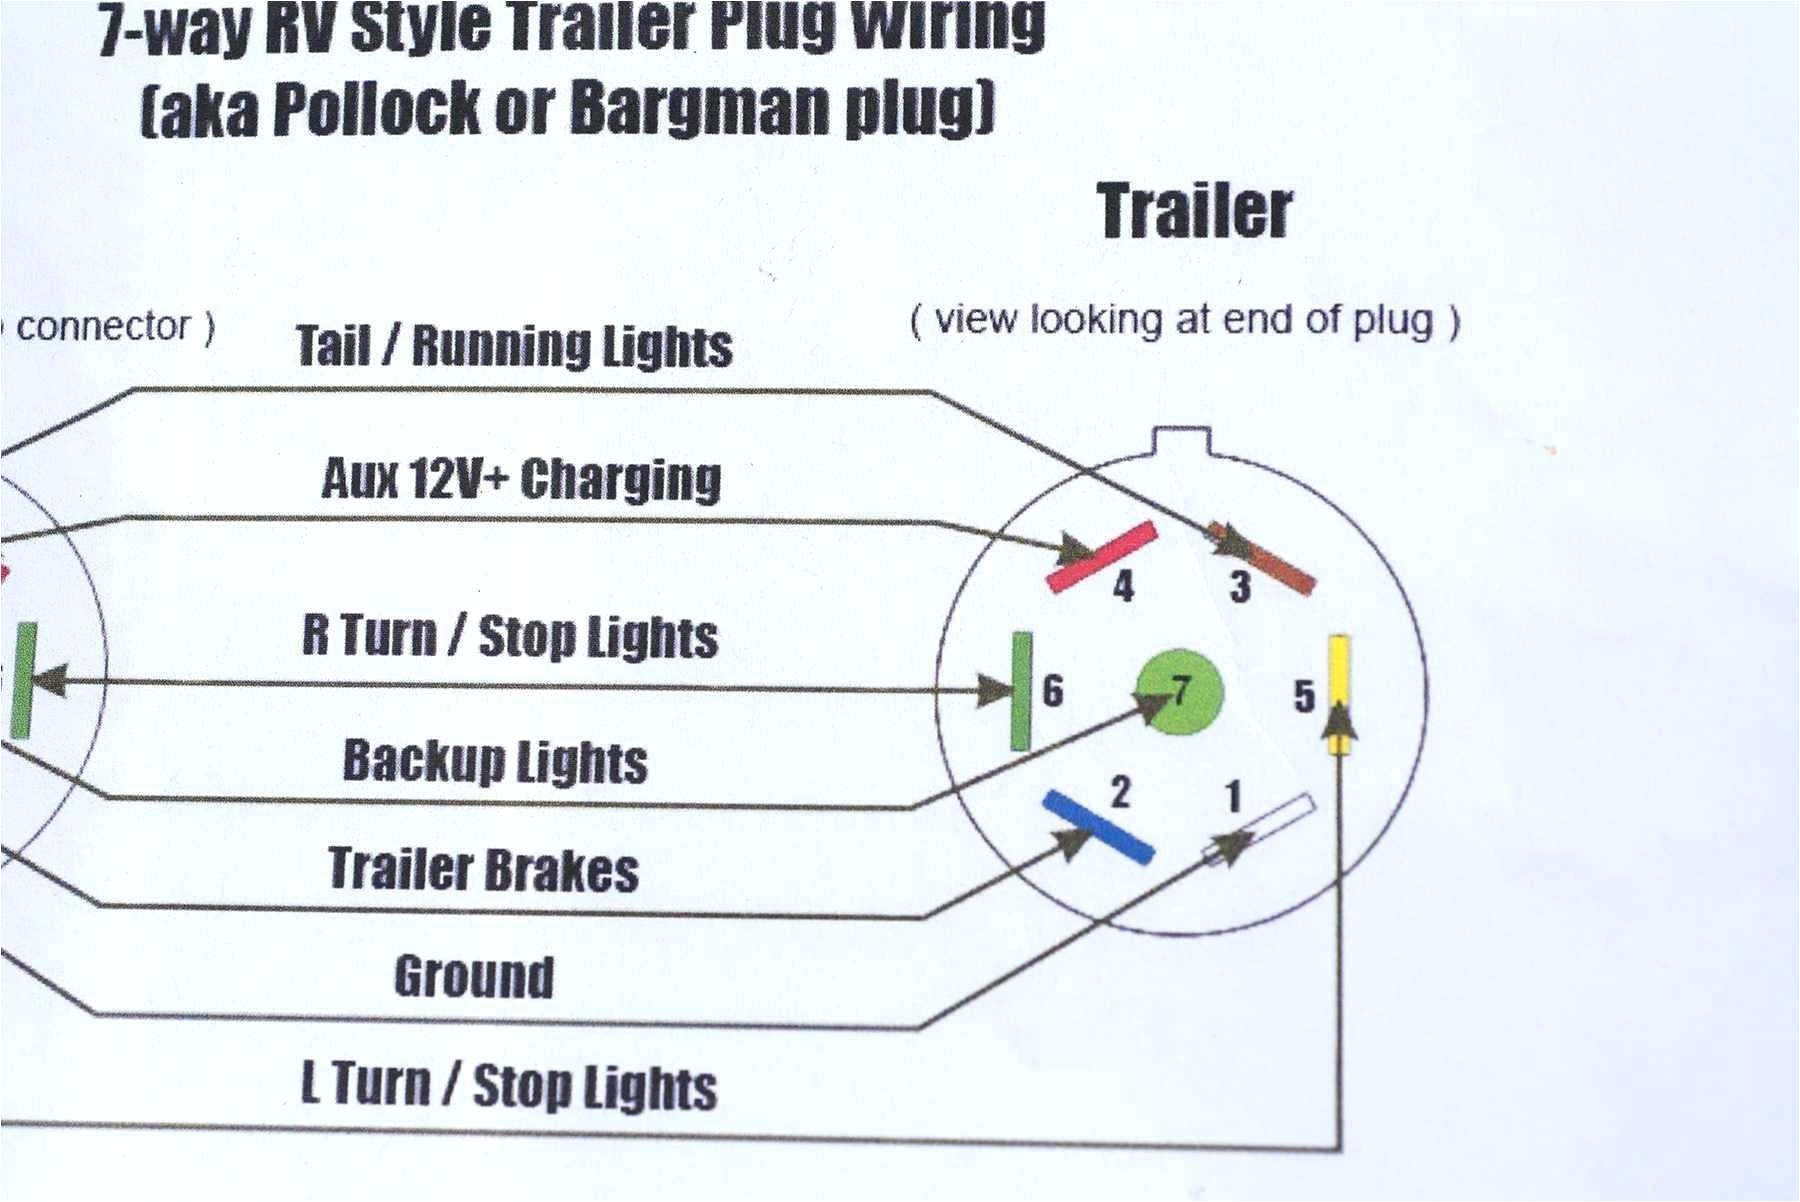 utility pole trailer wiring diagram 7 premium wiring diagram blog 7 pin wiring harness diagram free download